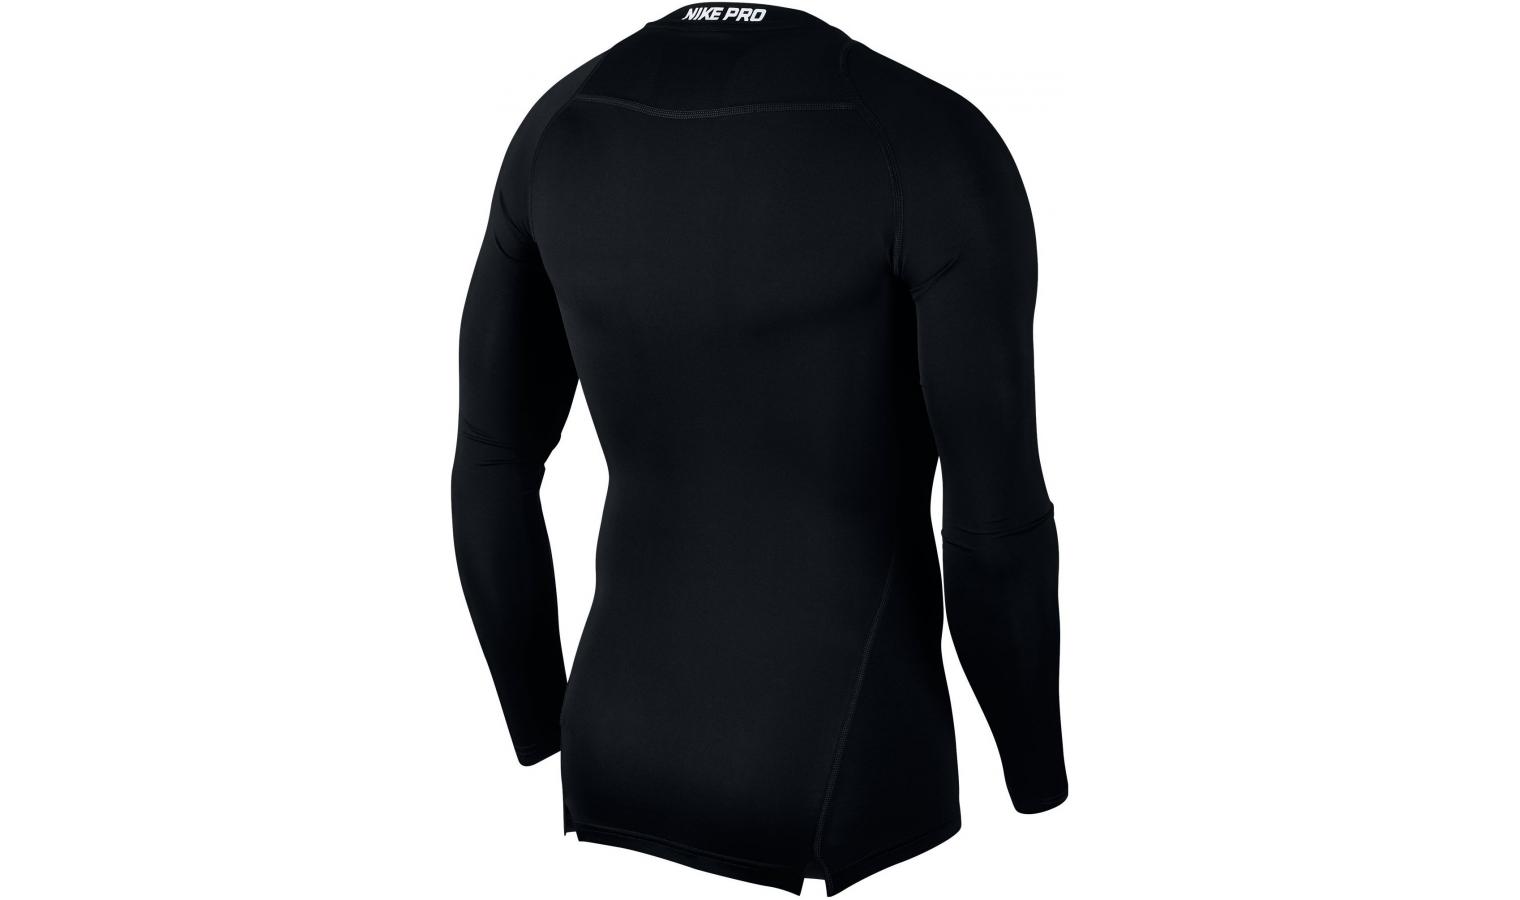 09025d4ff27f Pánske kompresné tričko Nike PRO TOP čierne